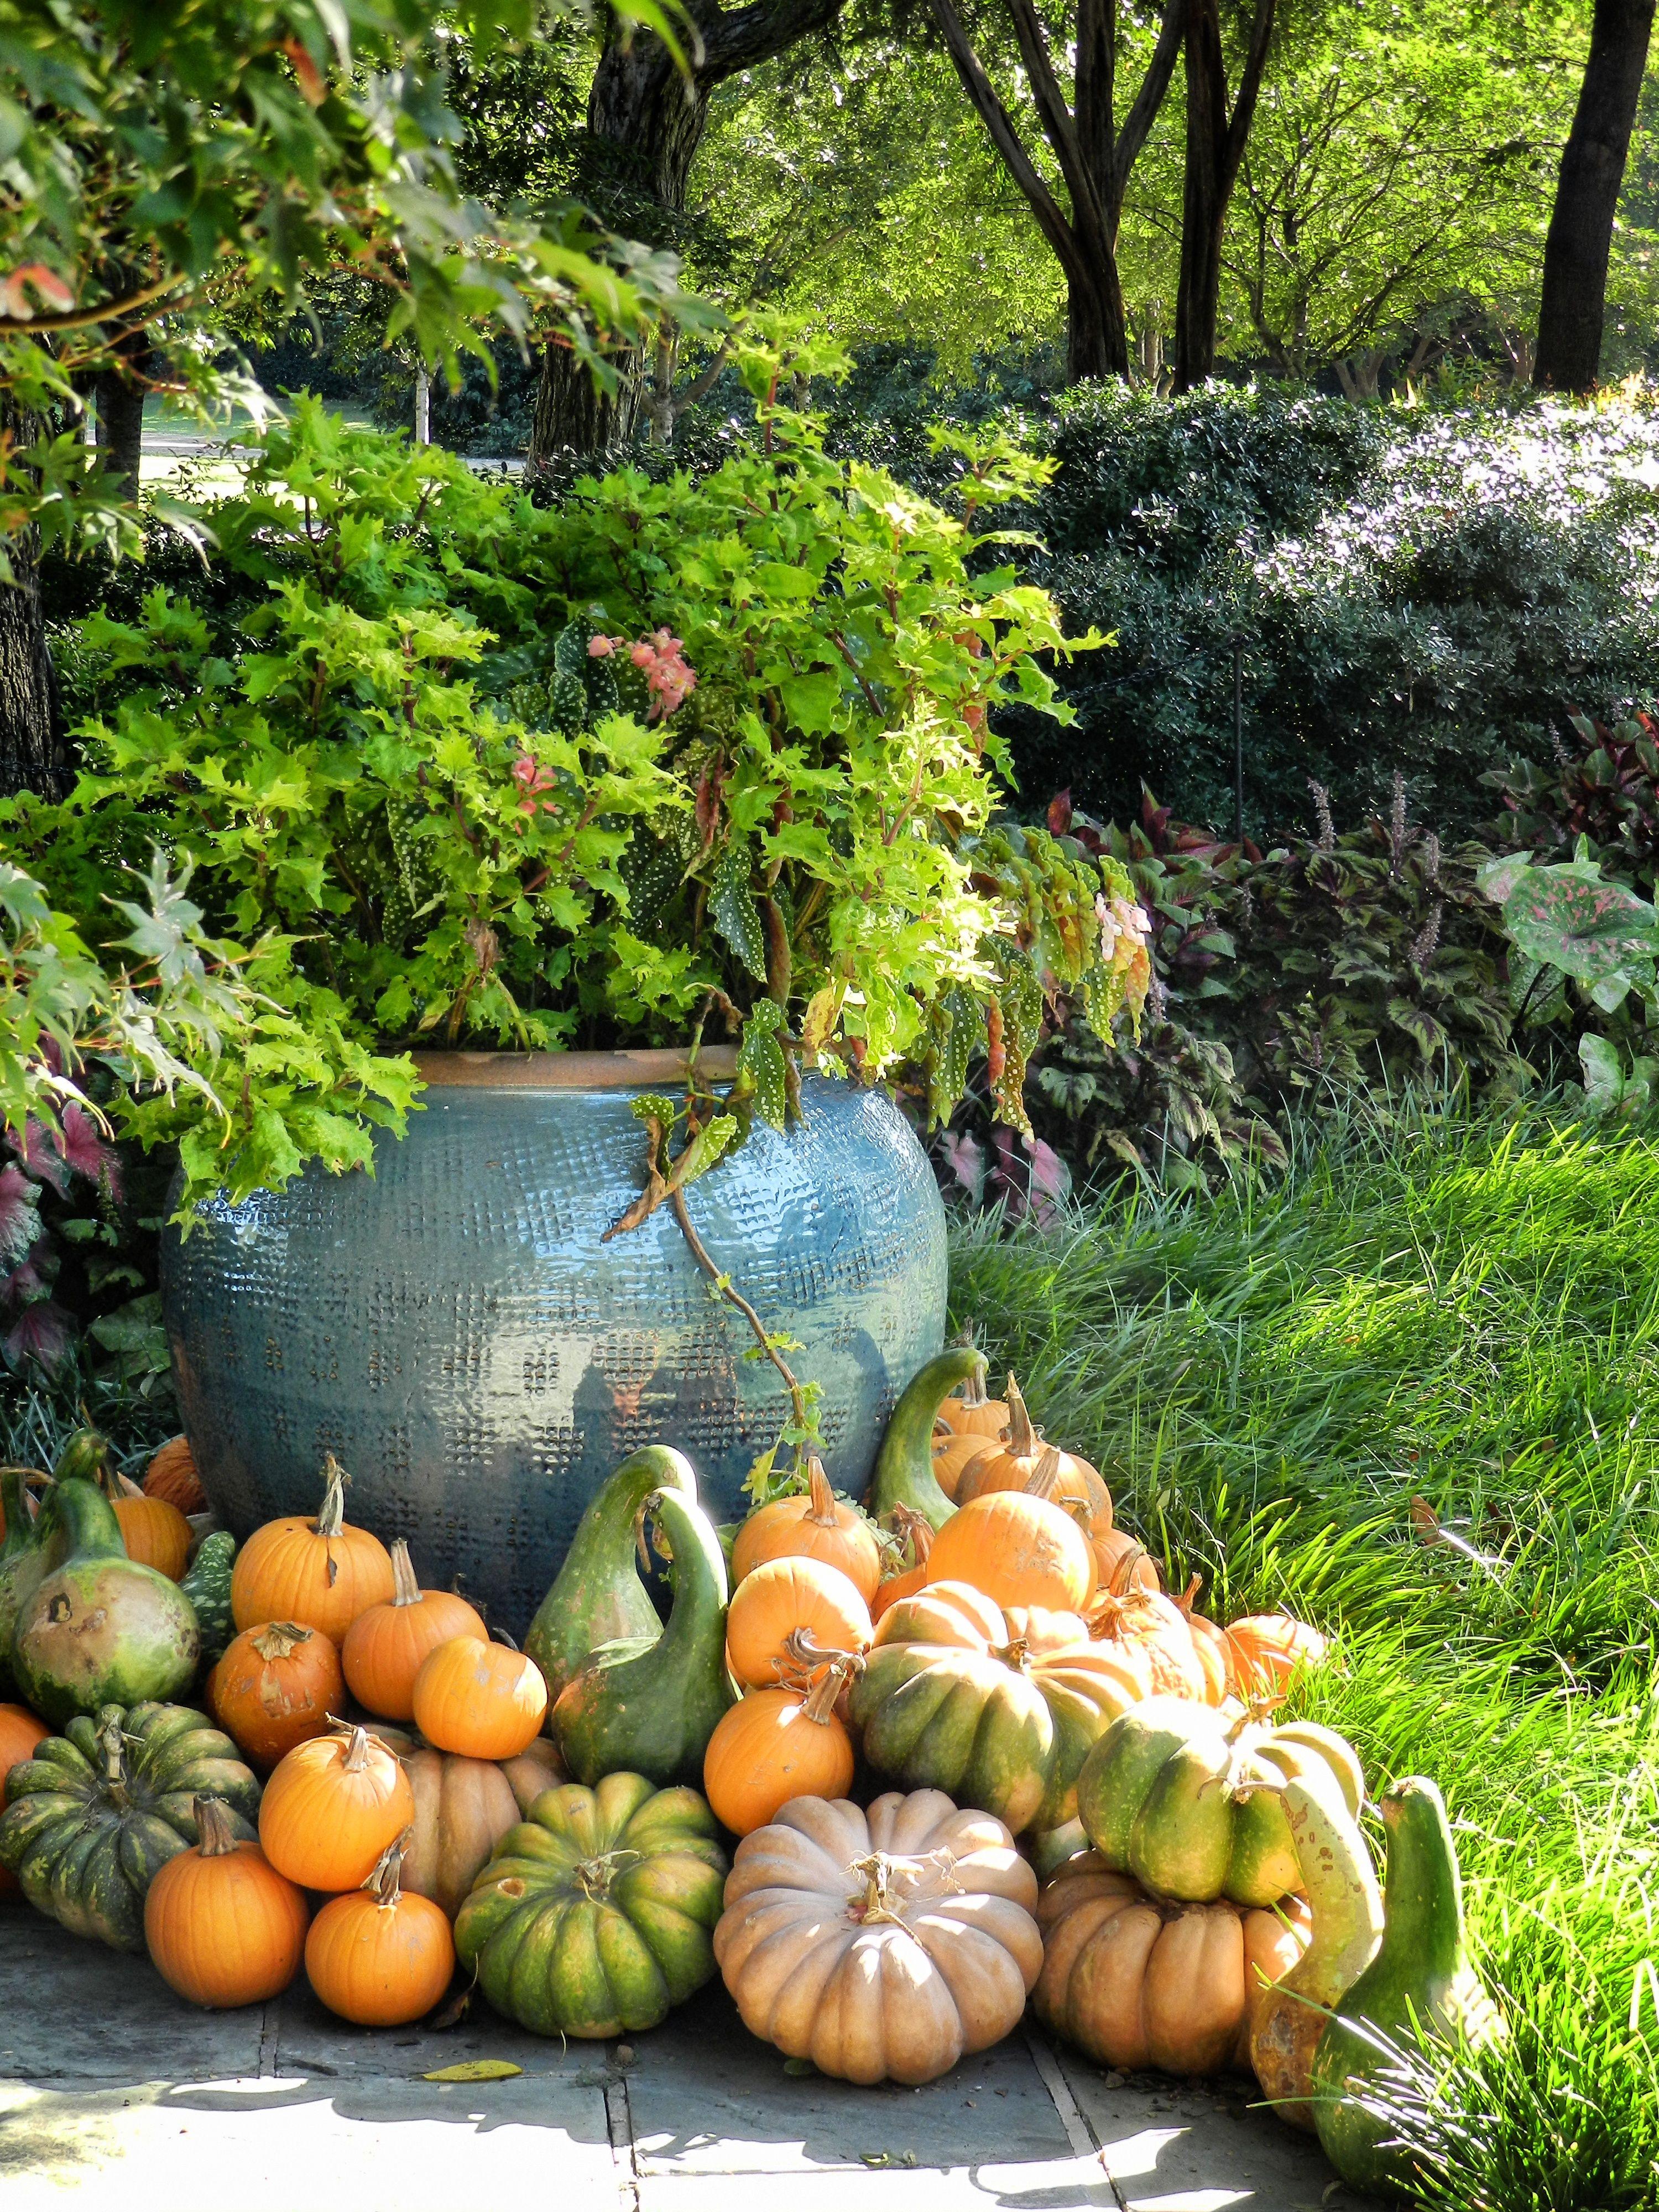 Autumn at The Arboretum, Garden, Flowers, Gourds, Pumpkins